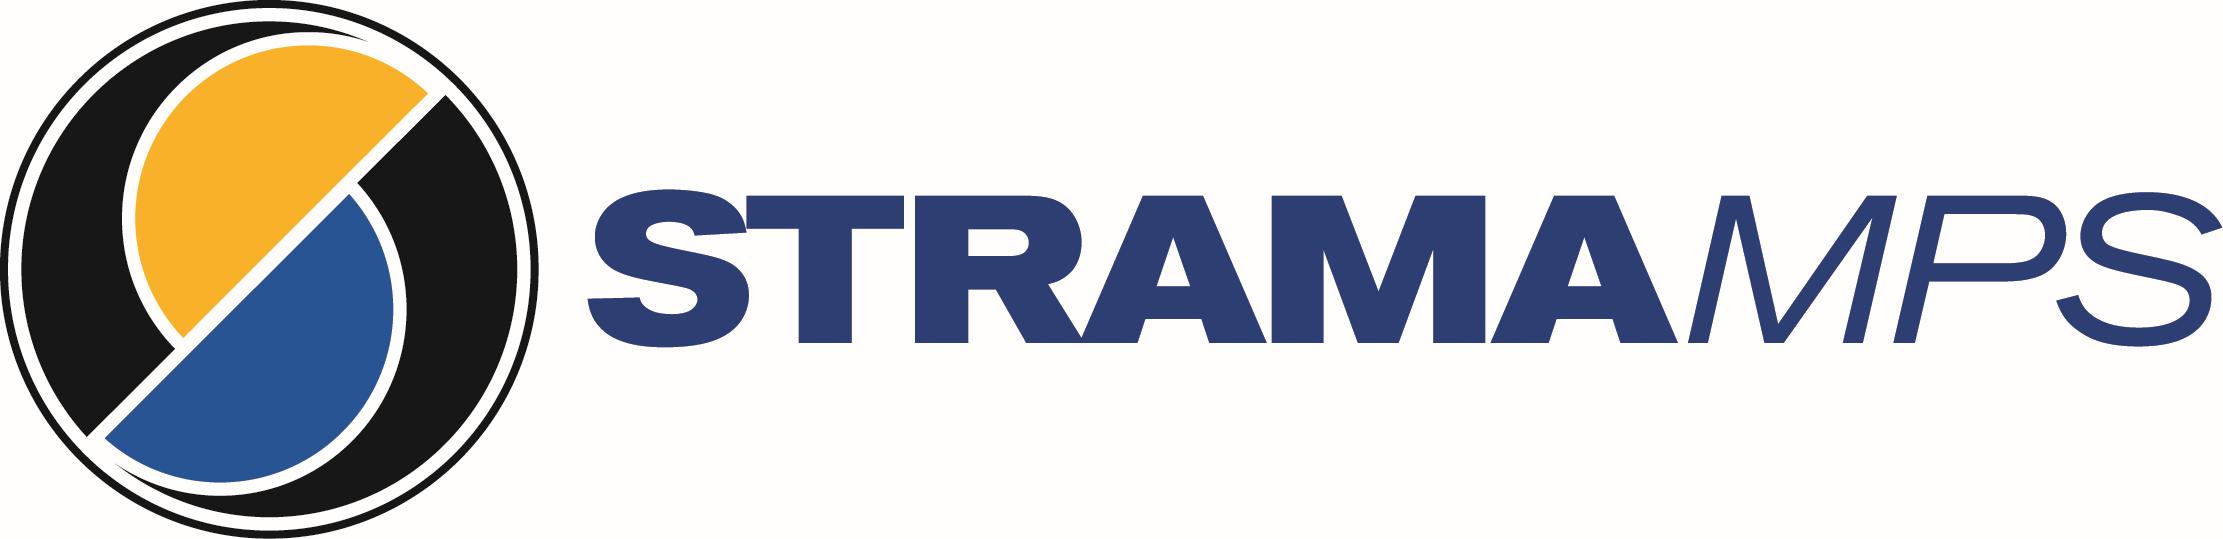 Strama - E- Mobility